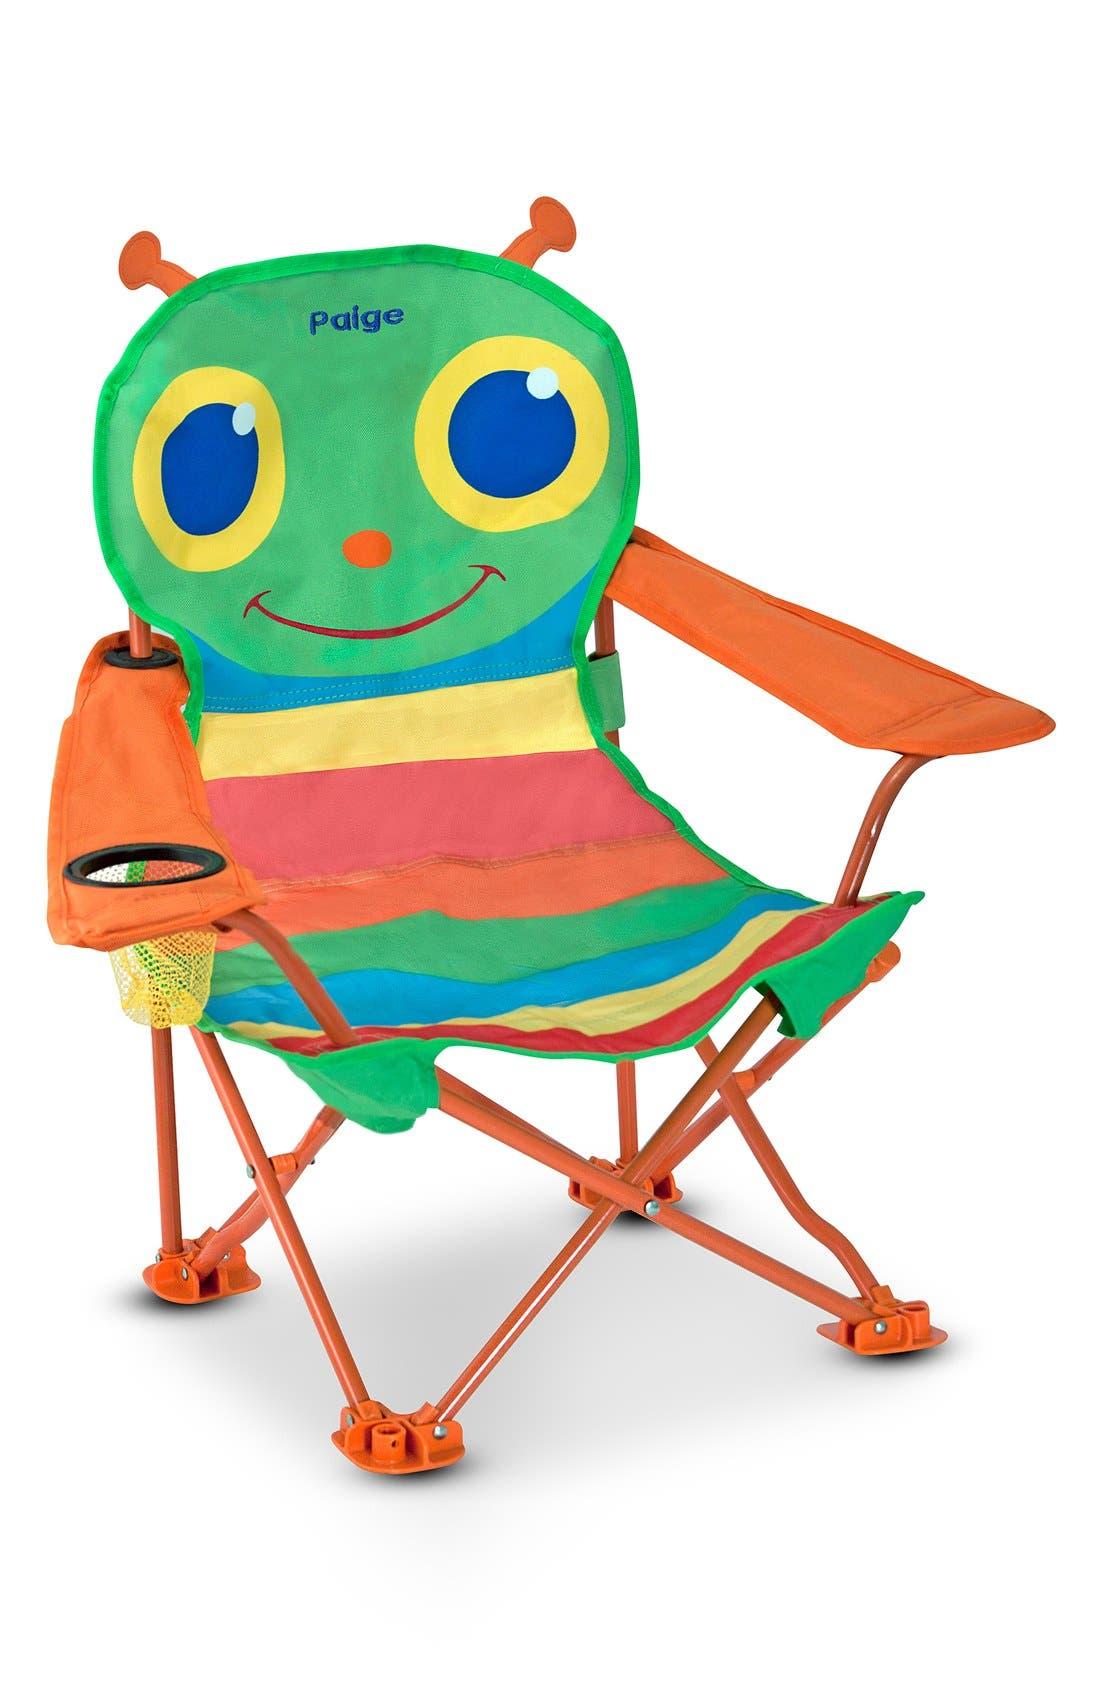 Melissa & Doug 'Happy Giddy' Personalized Folding Chair